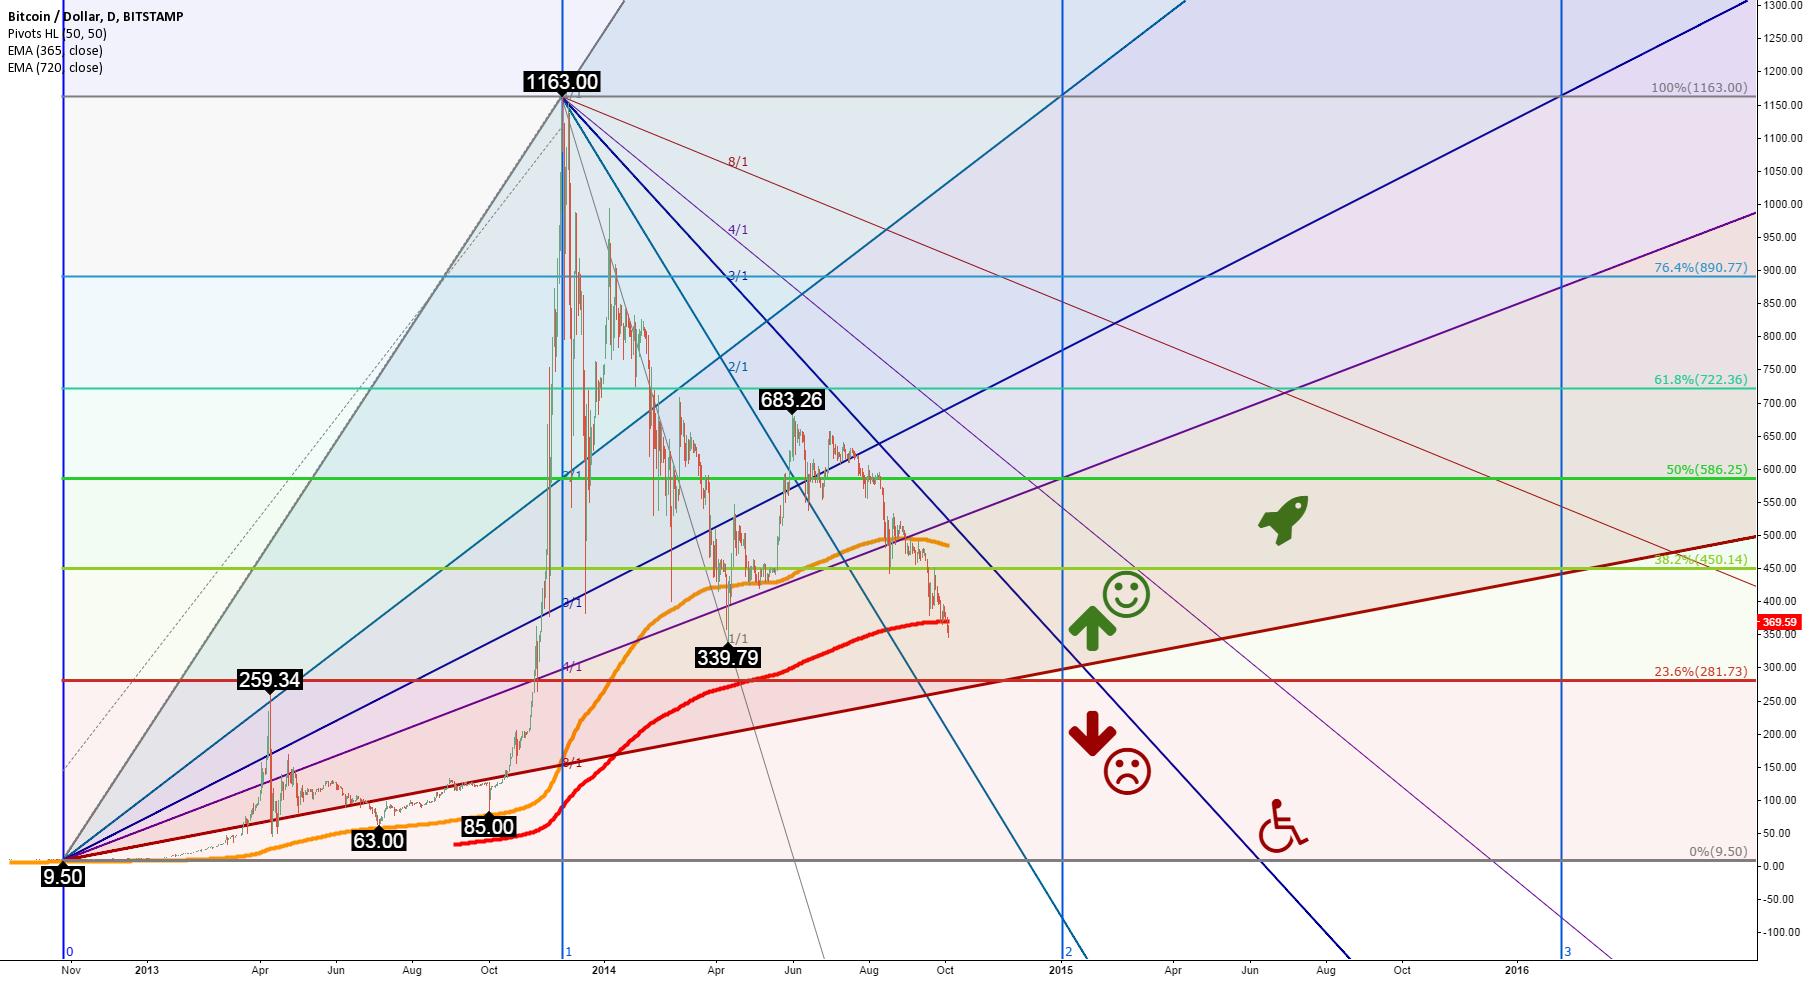 Bitcoin price doom analysis: Why Bitcoin might crash to $85-$110